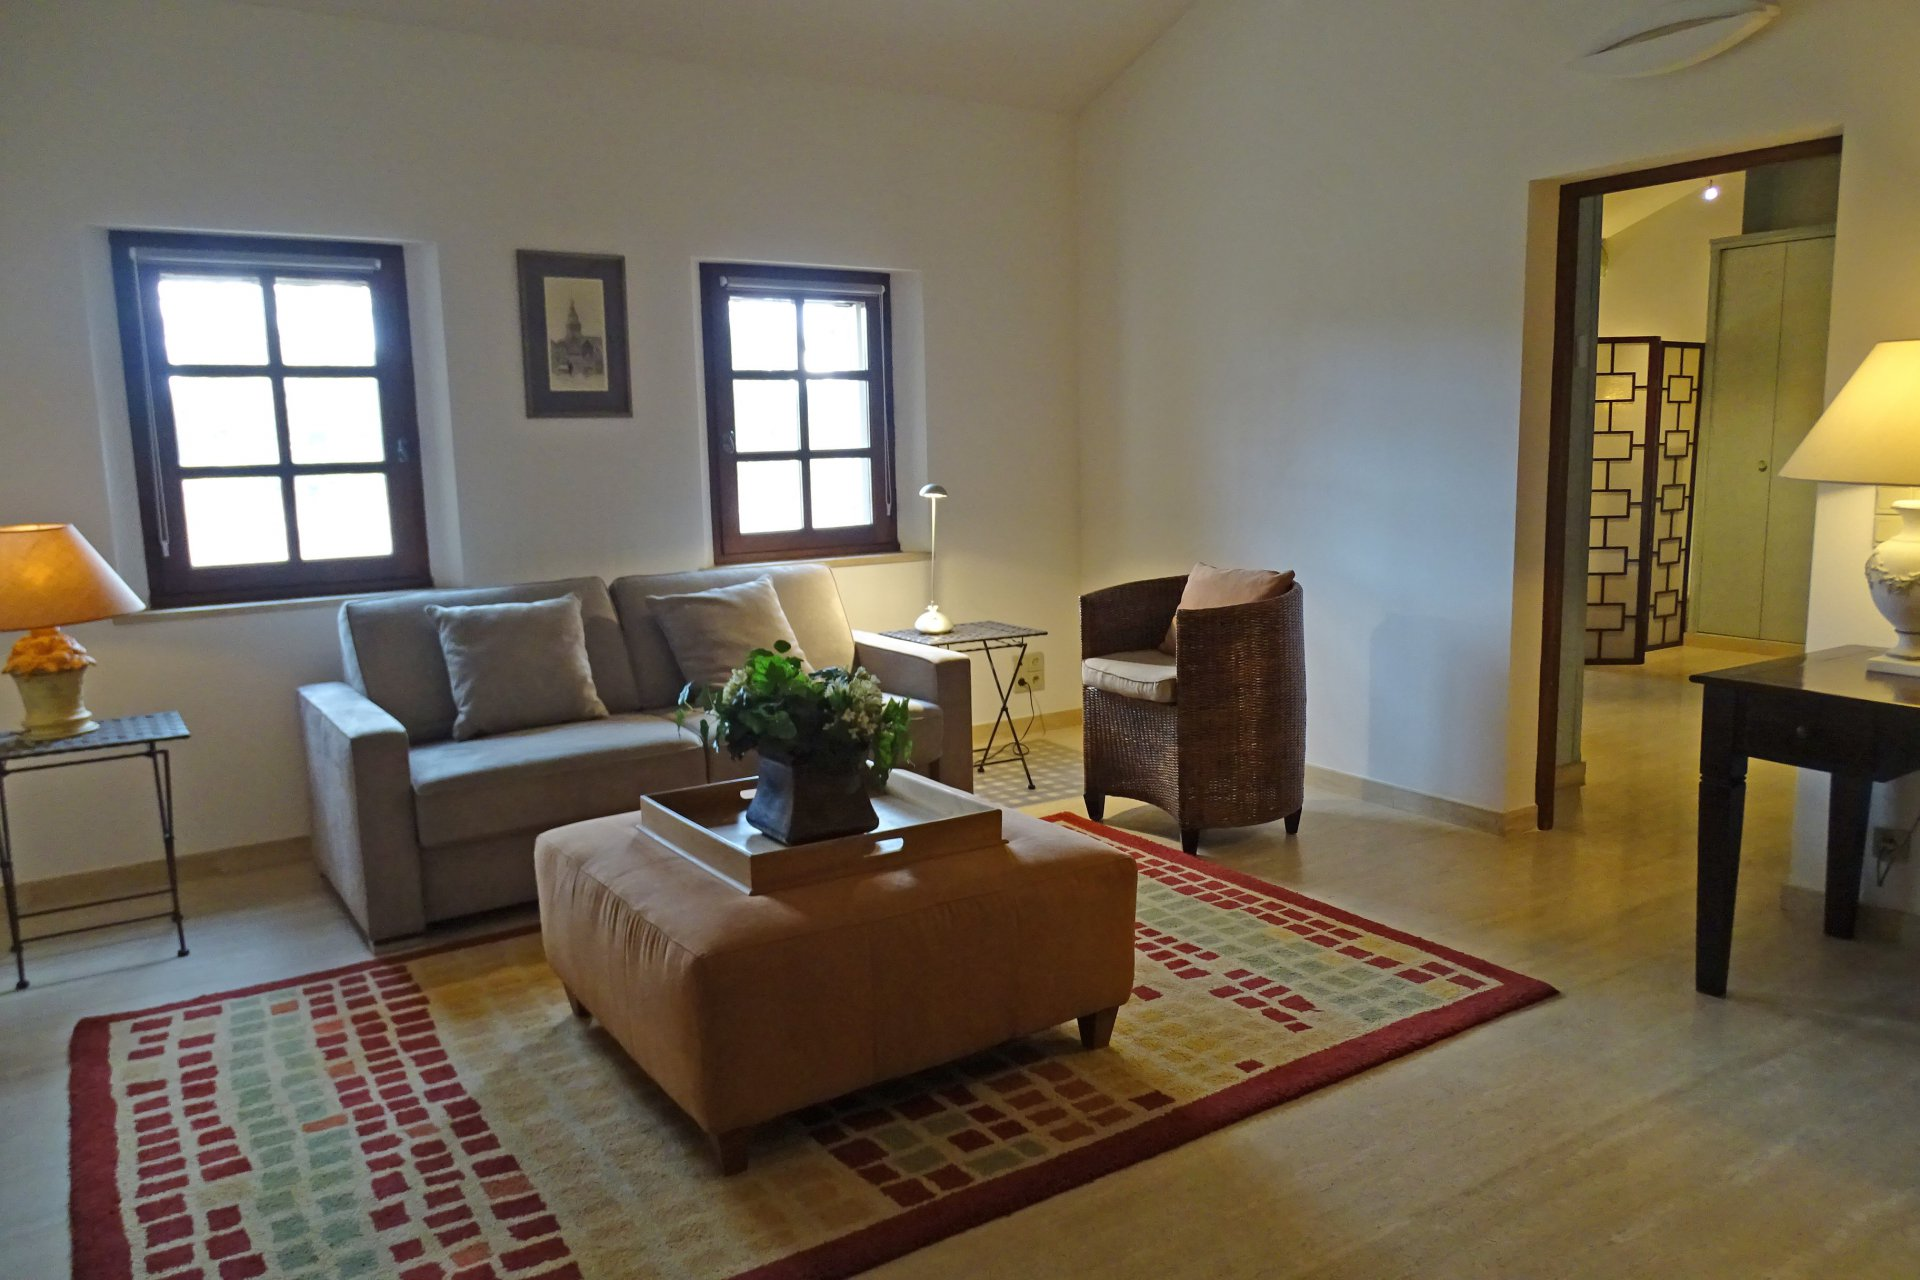 Living-room, natural light, high ceiling, wood floors